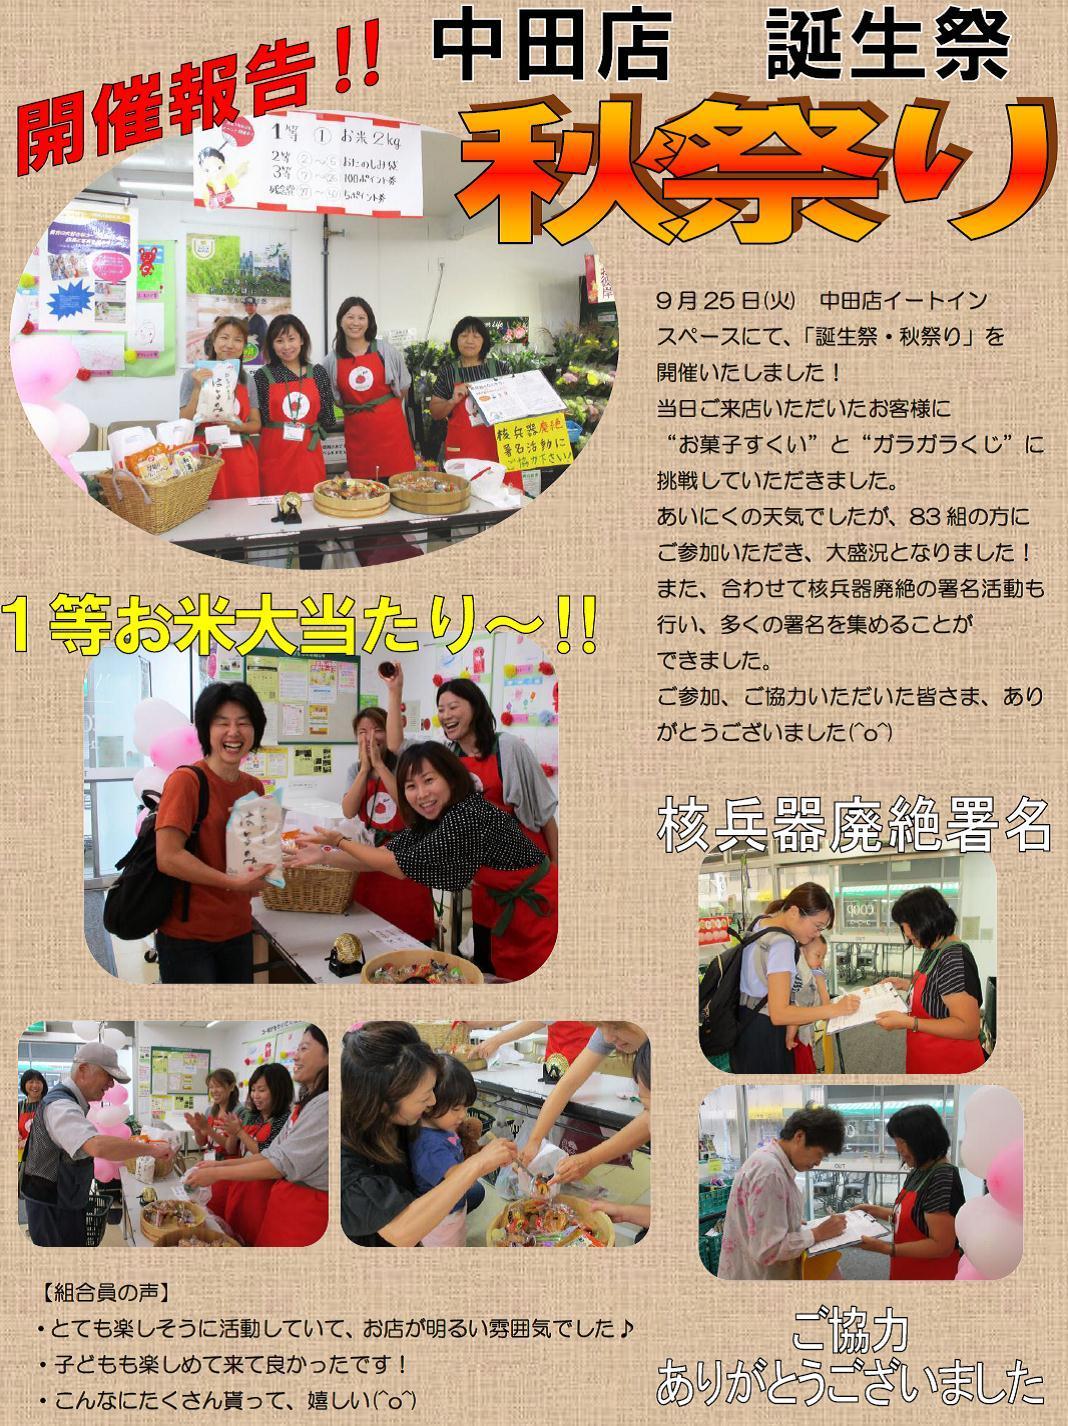 http://kanagawa.ucoop.or.jp/hiroba/areanews/files/892eec3a3c06e8d78ab6f331dba9542c.jpg